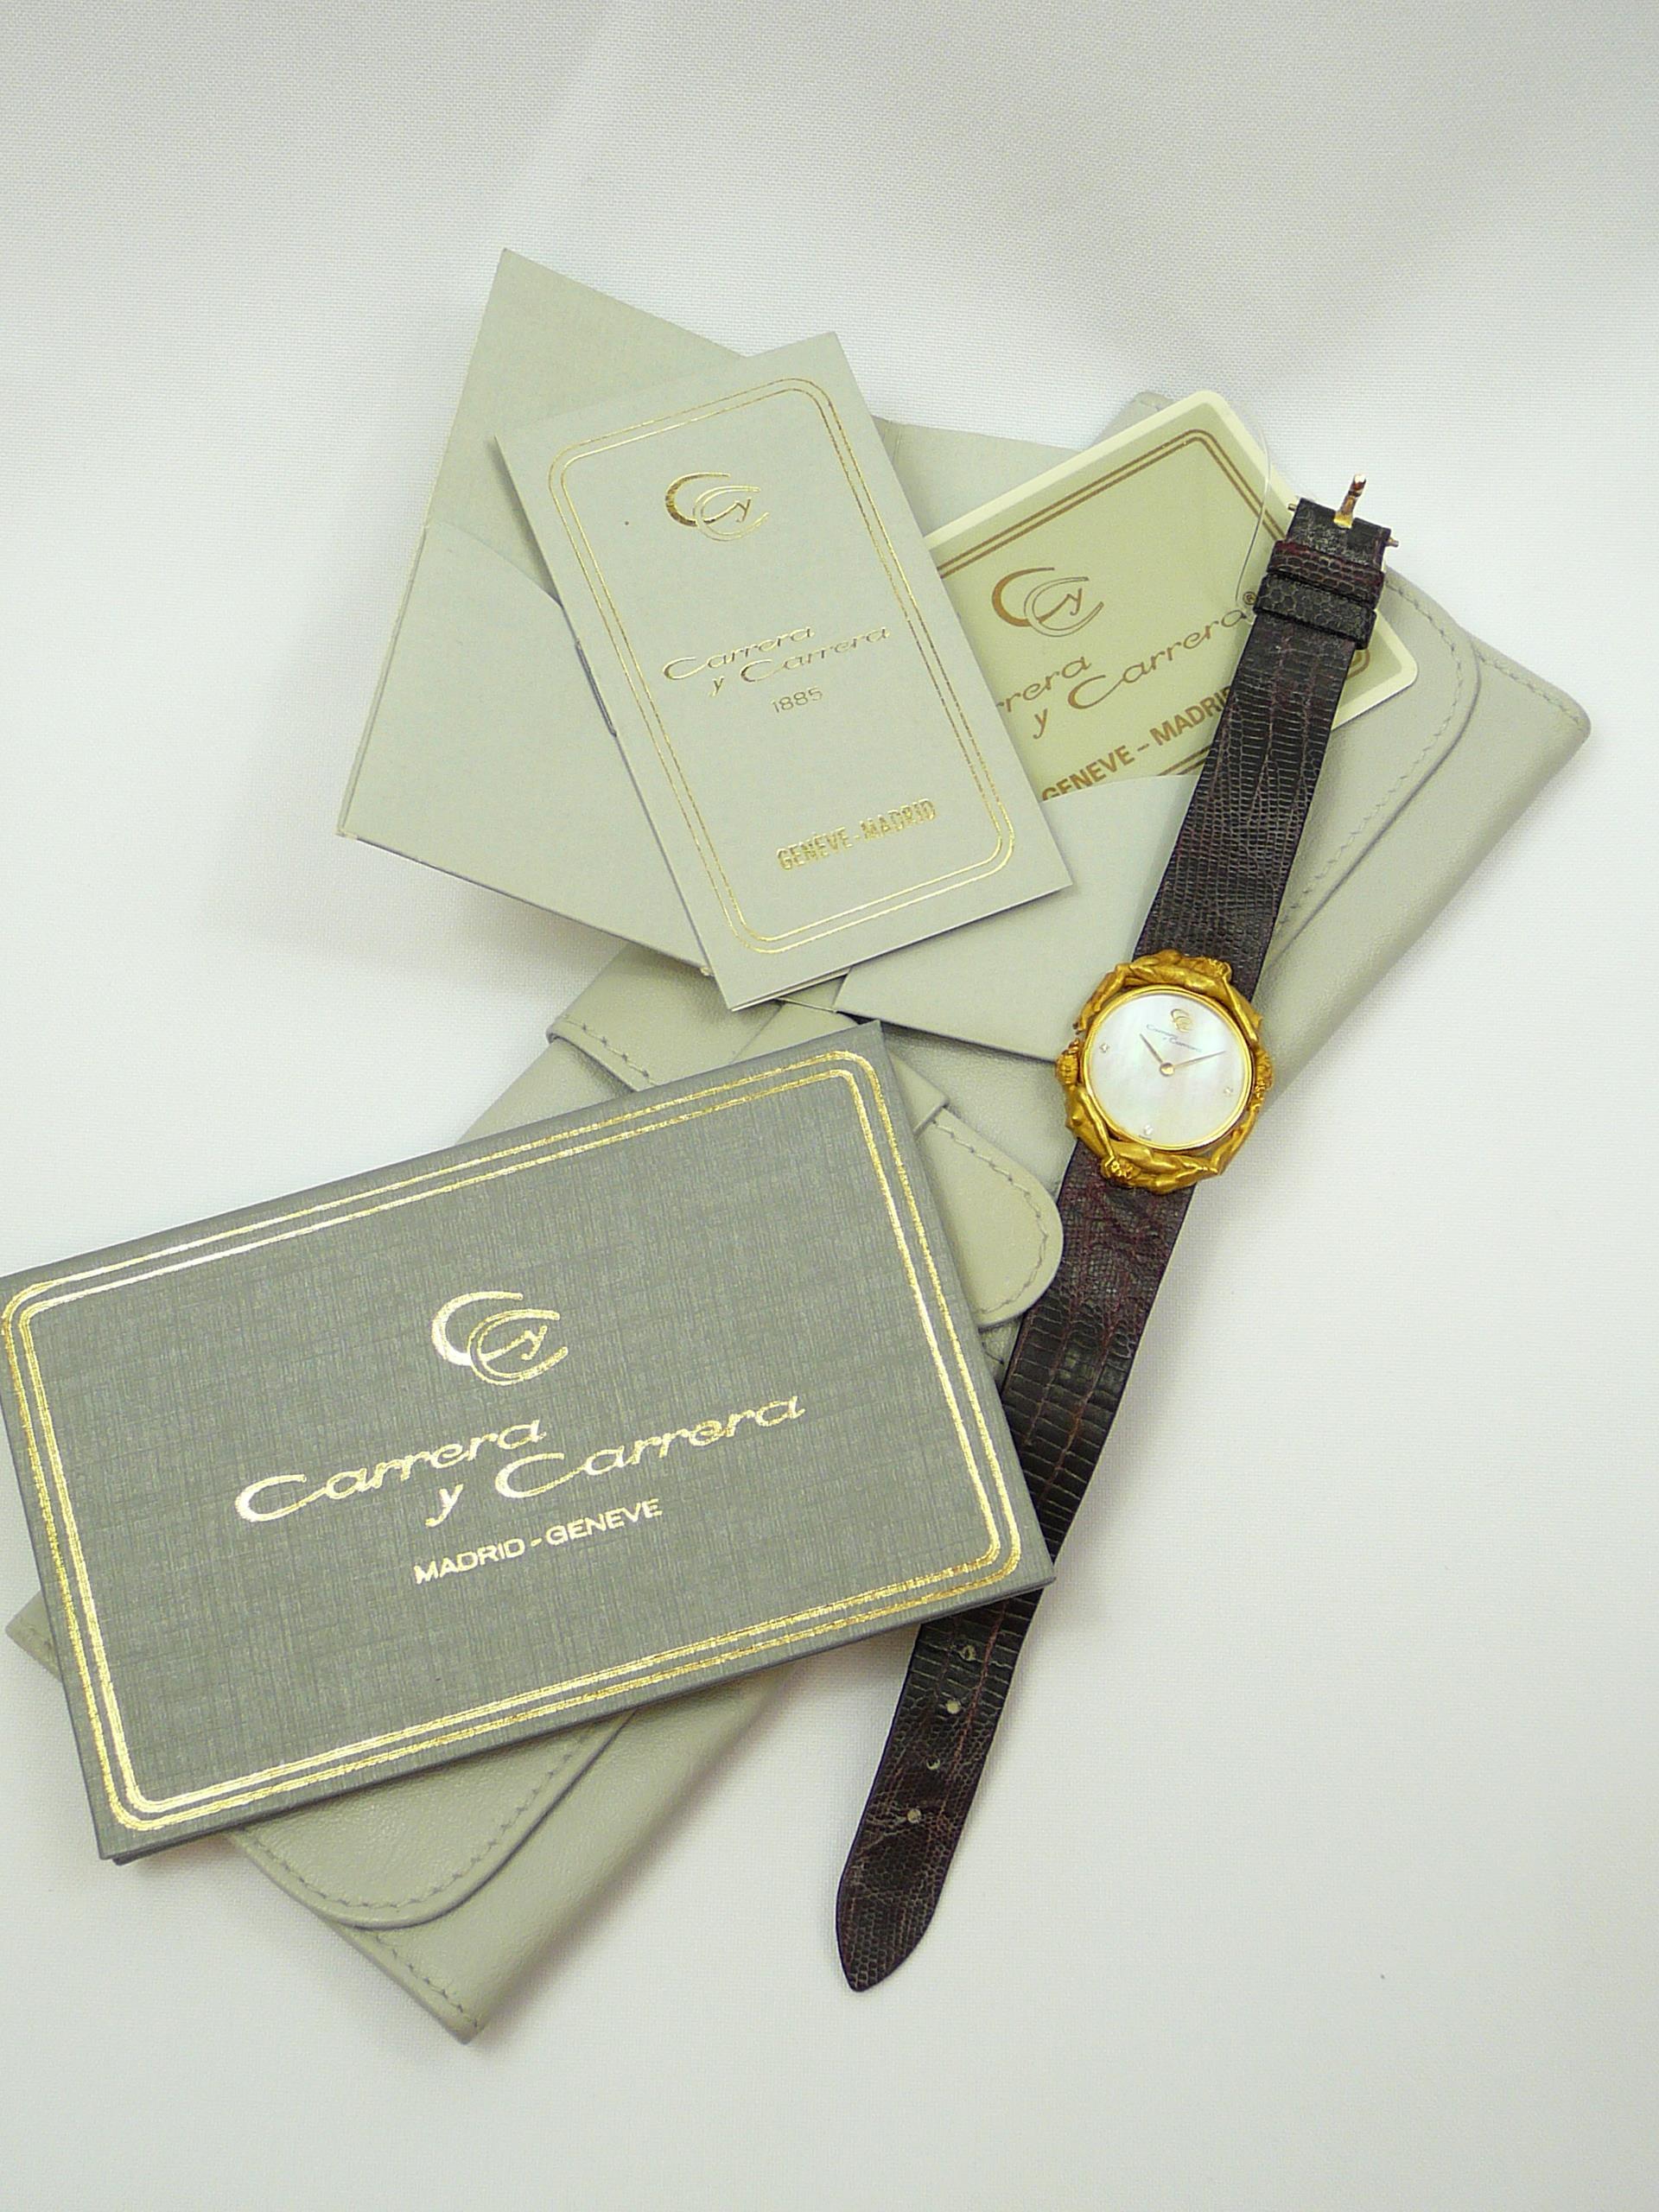 Ladies Carrera Y Carrera Gold Wrist Watch - Image 5 of 6